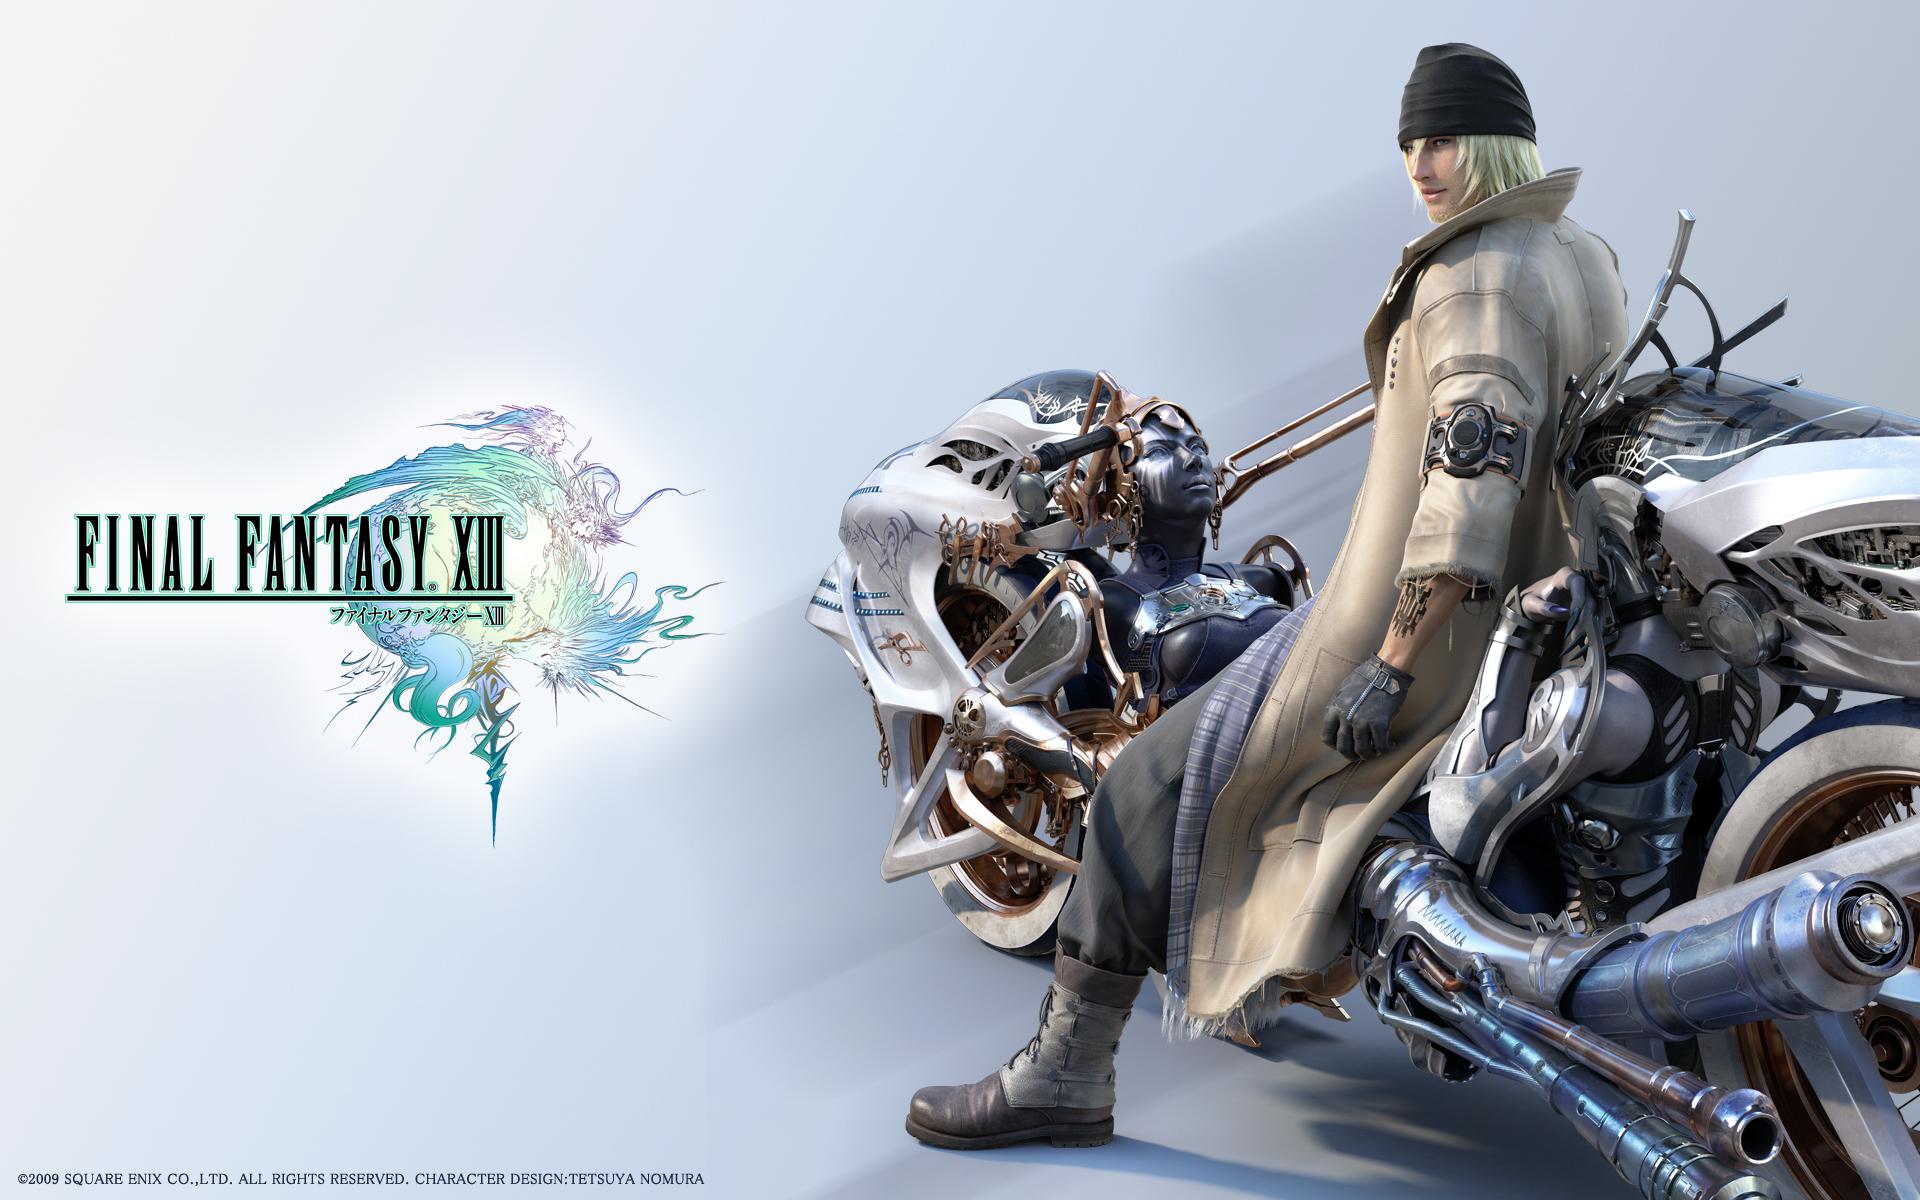 Final Fantasy XIII | FF13 Wallpaper | The Final Fantasy